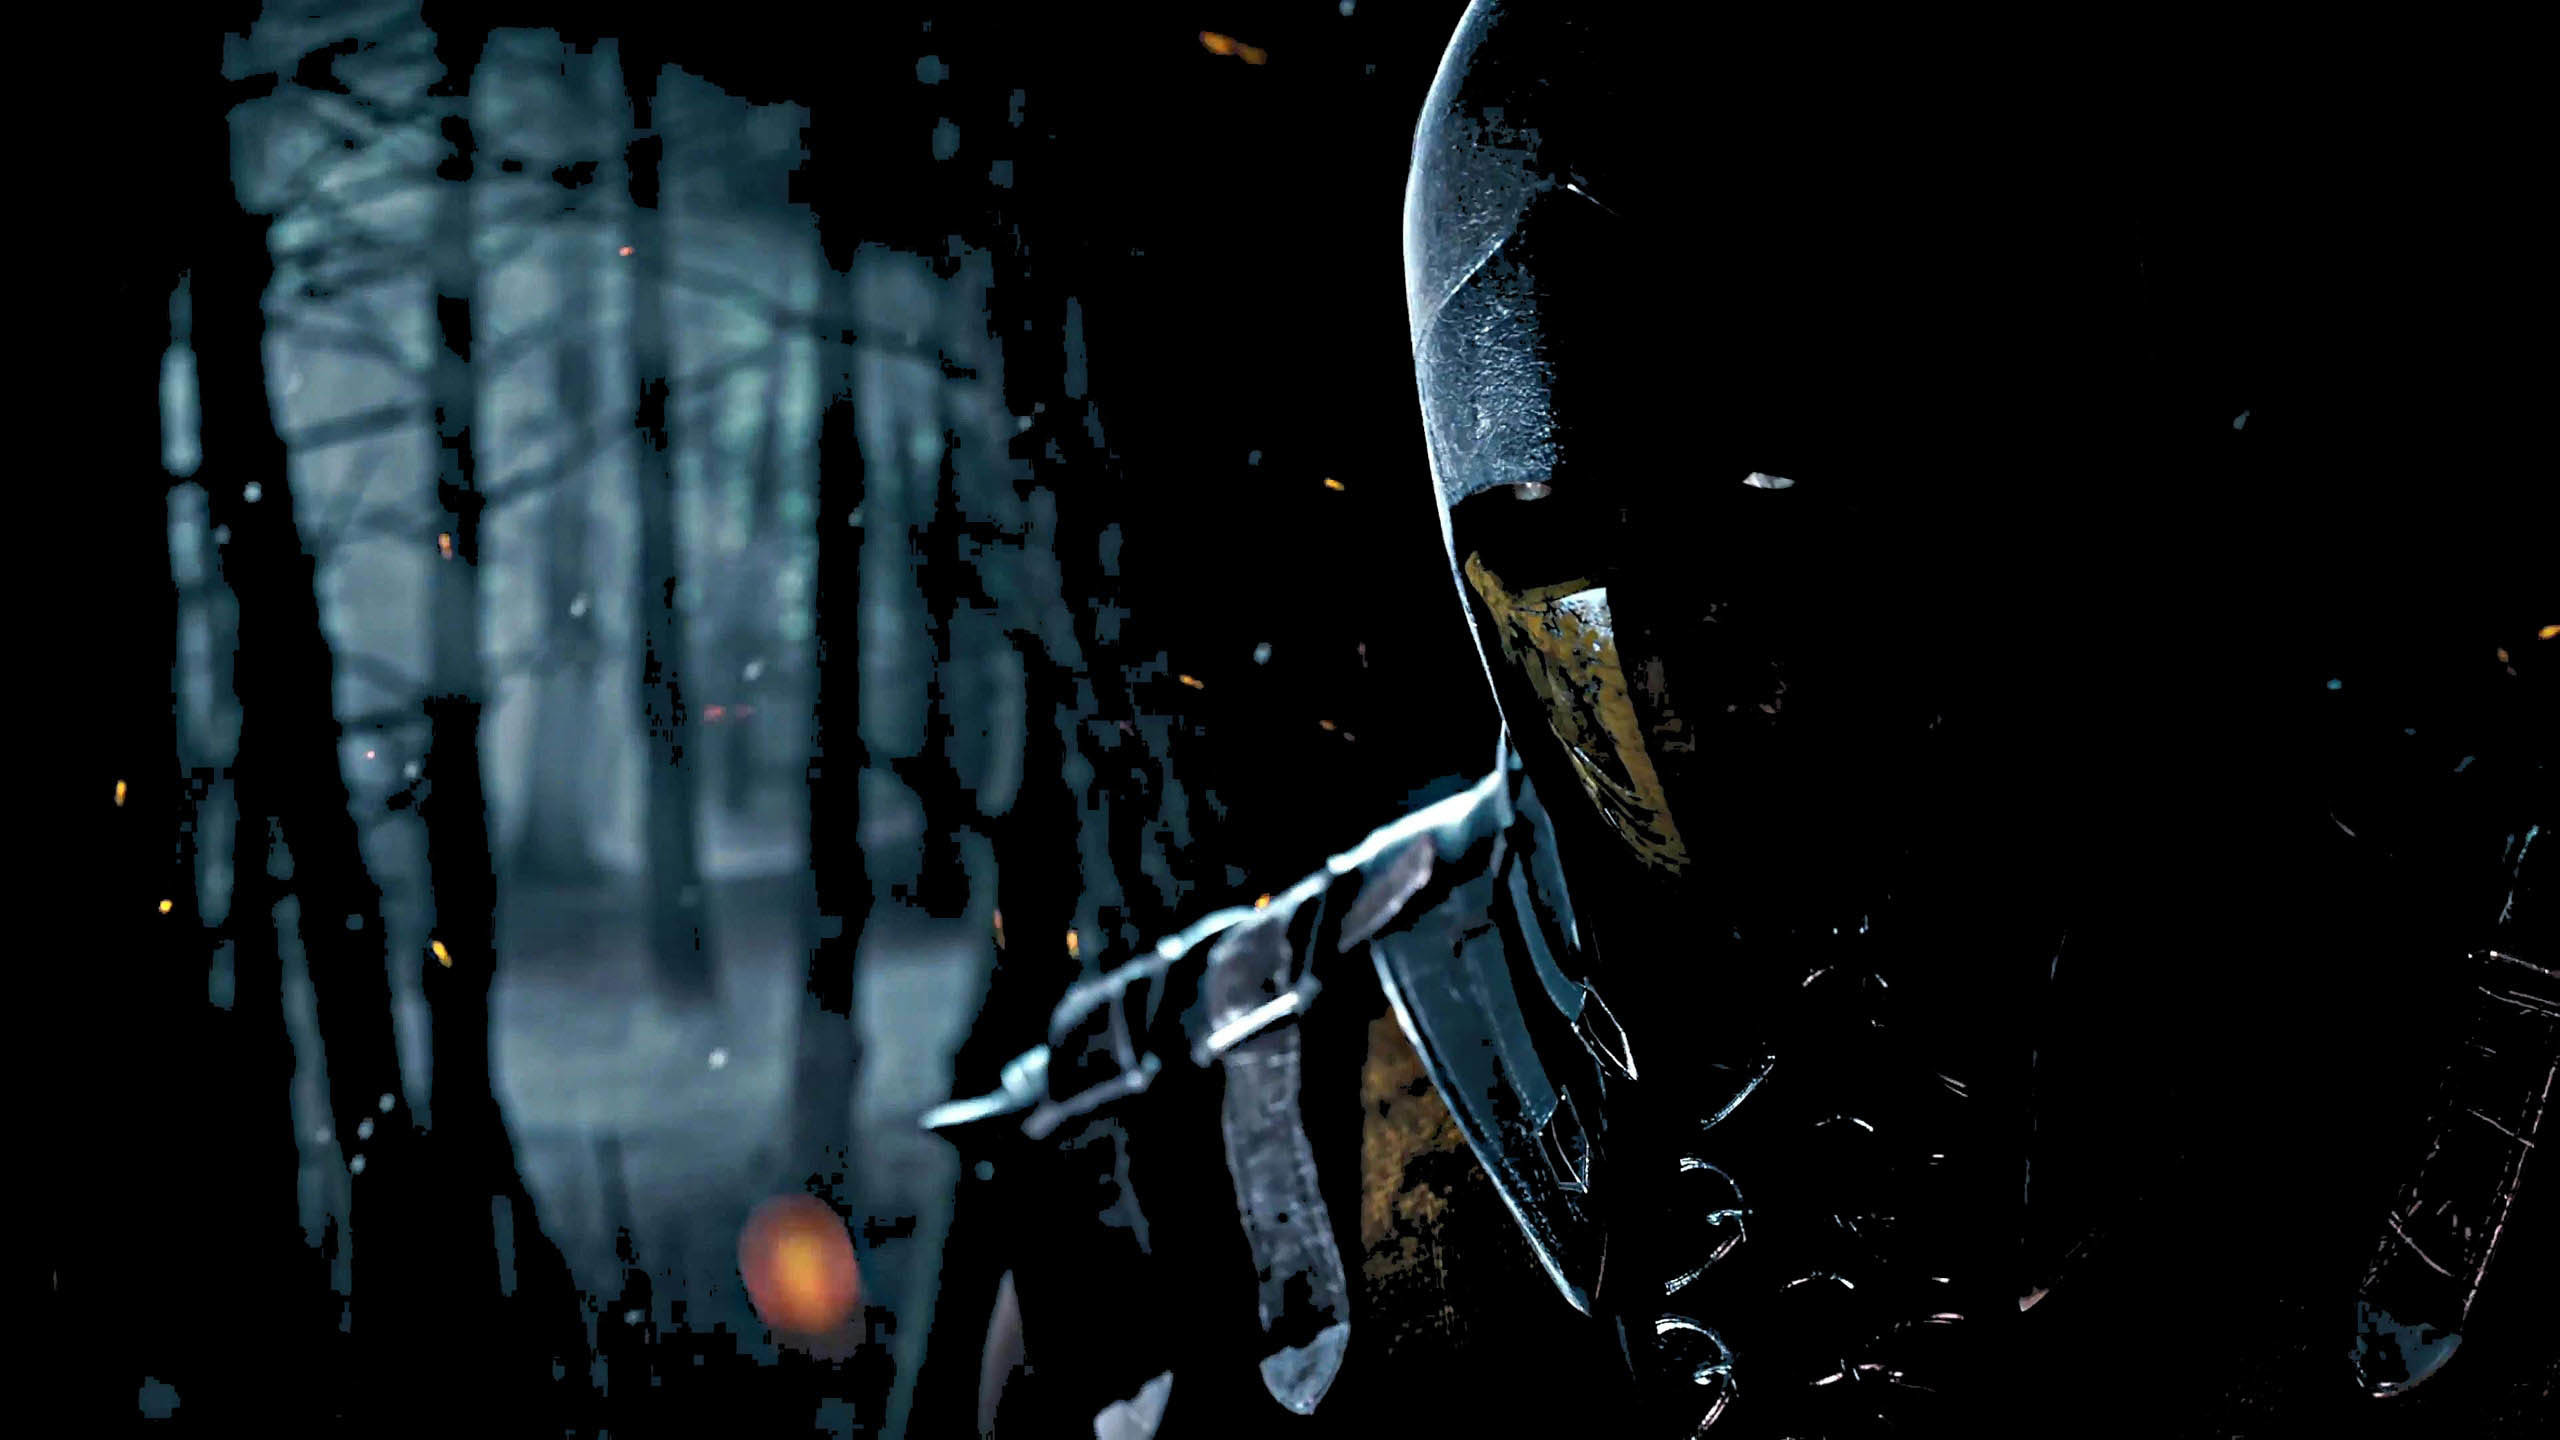 Mortal Kombat X Artwork: Scorpion in the Dark wallpaper